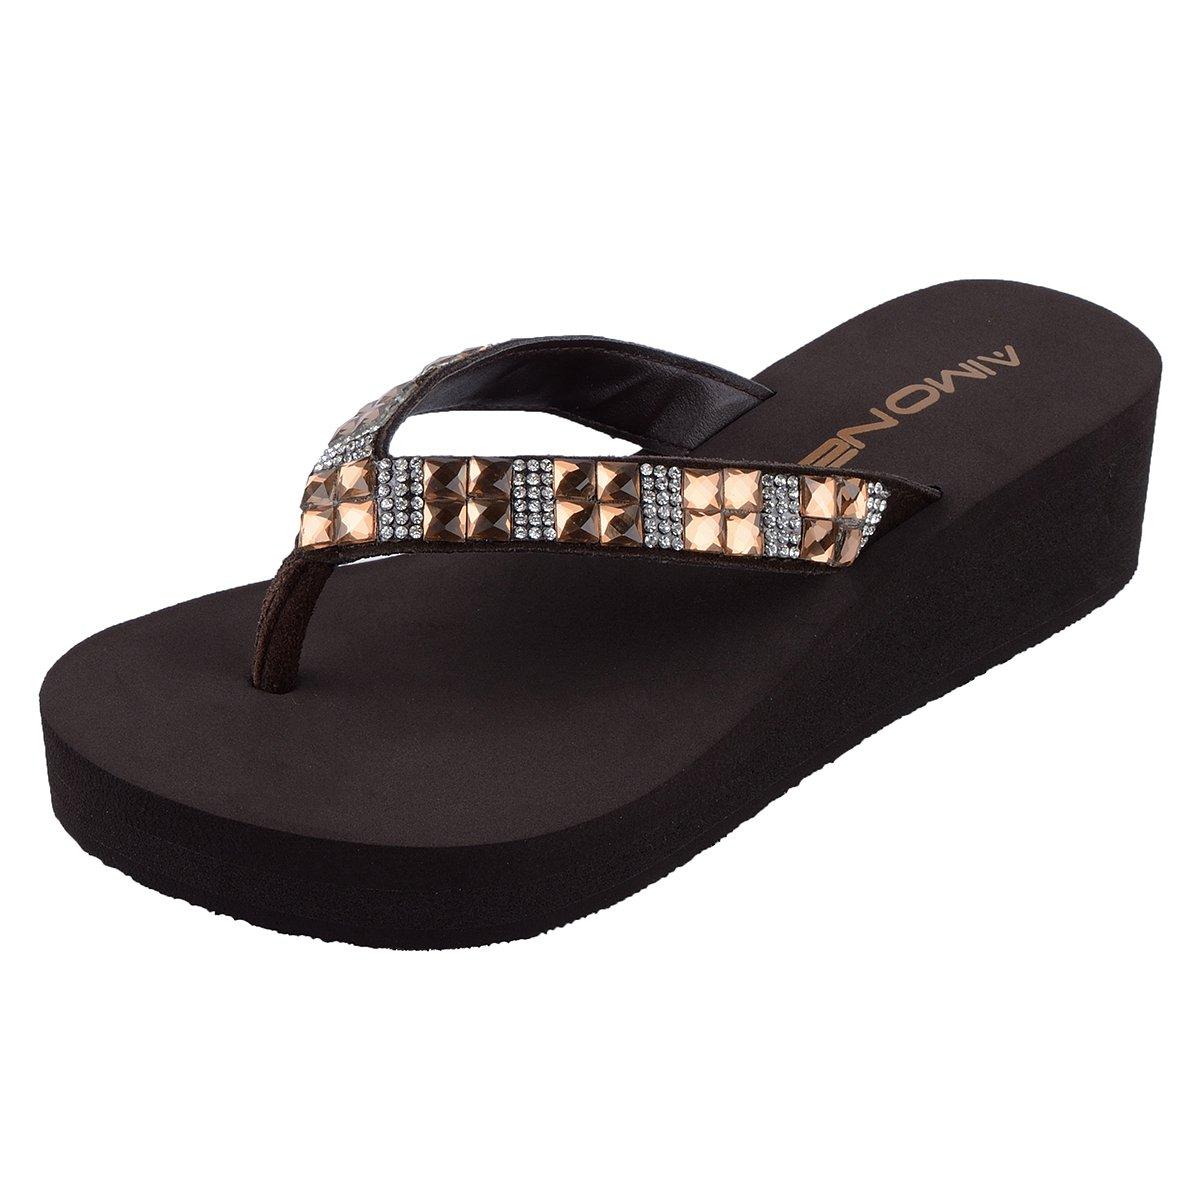 618fea8fc AIMONE Womens Delphine Mid Heel Rhinestone Brown Flip Flop Thongs - Casual Women s  Shoes